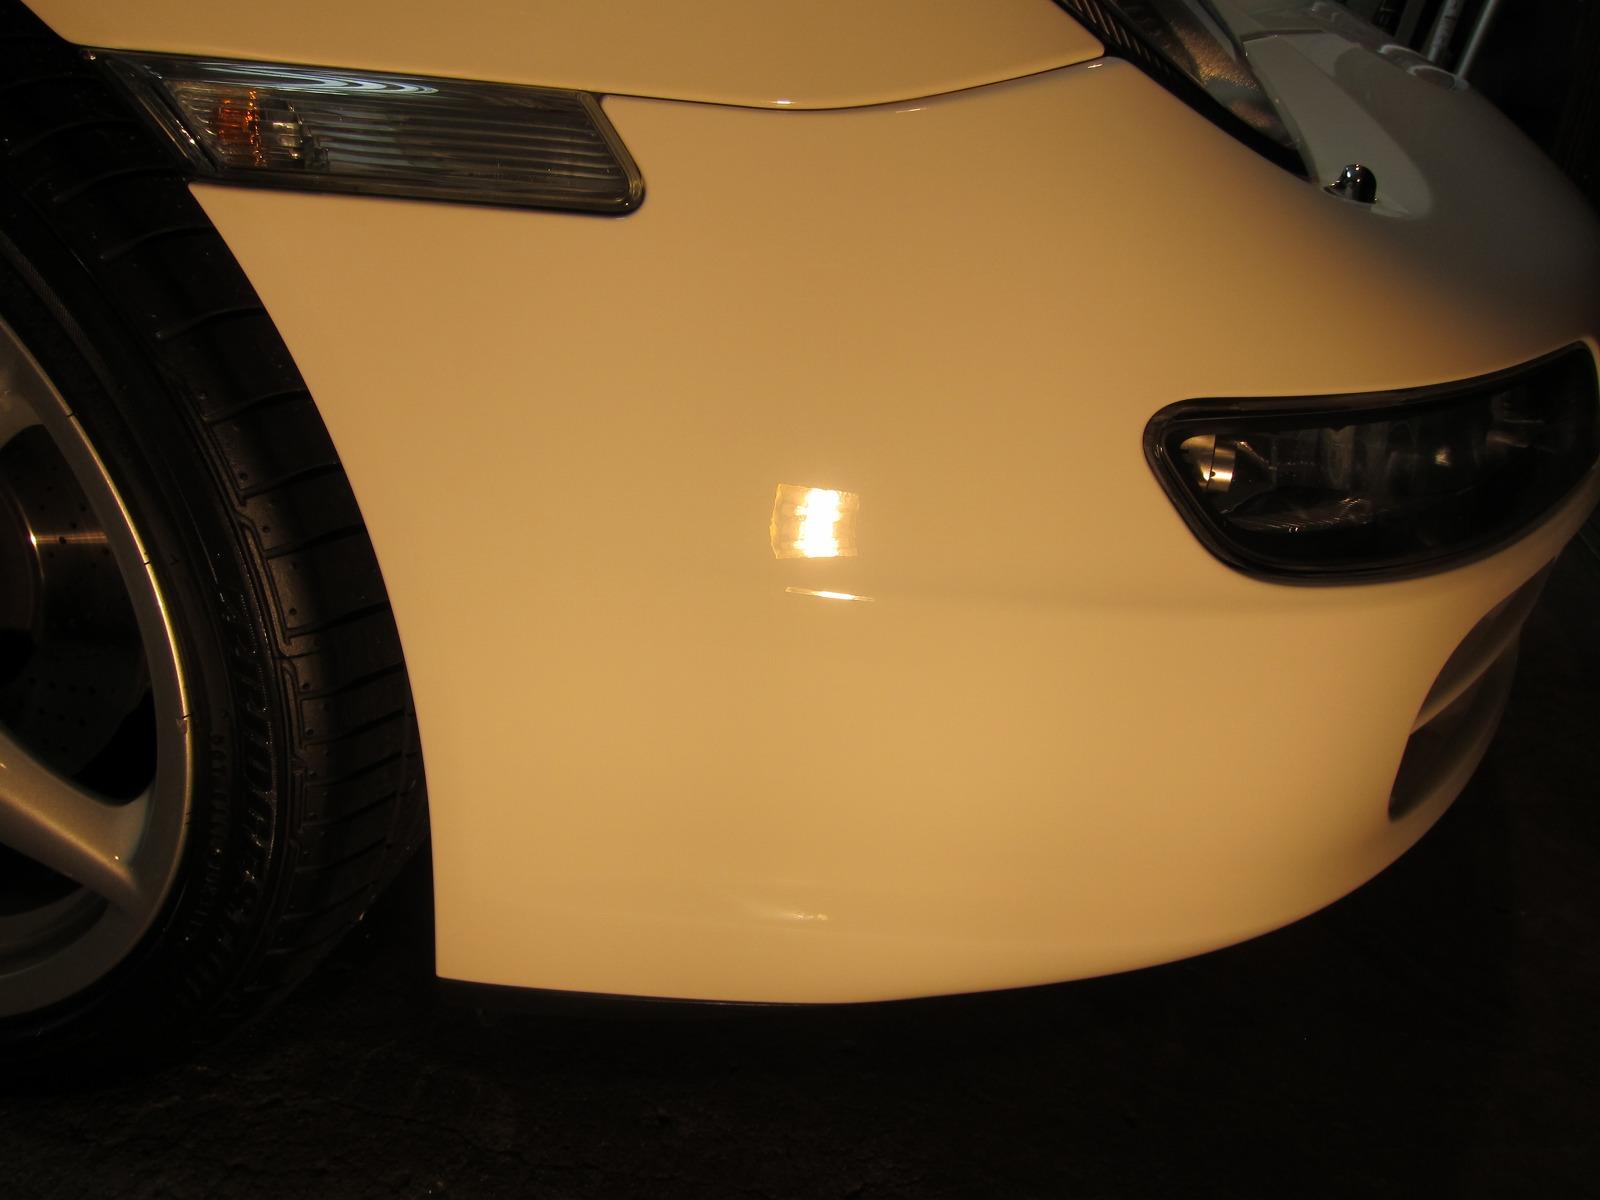 20130326-porsche-911carrera-06